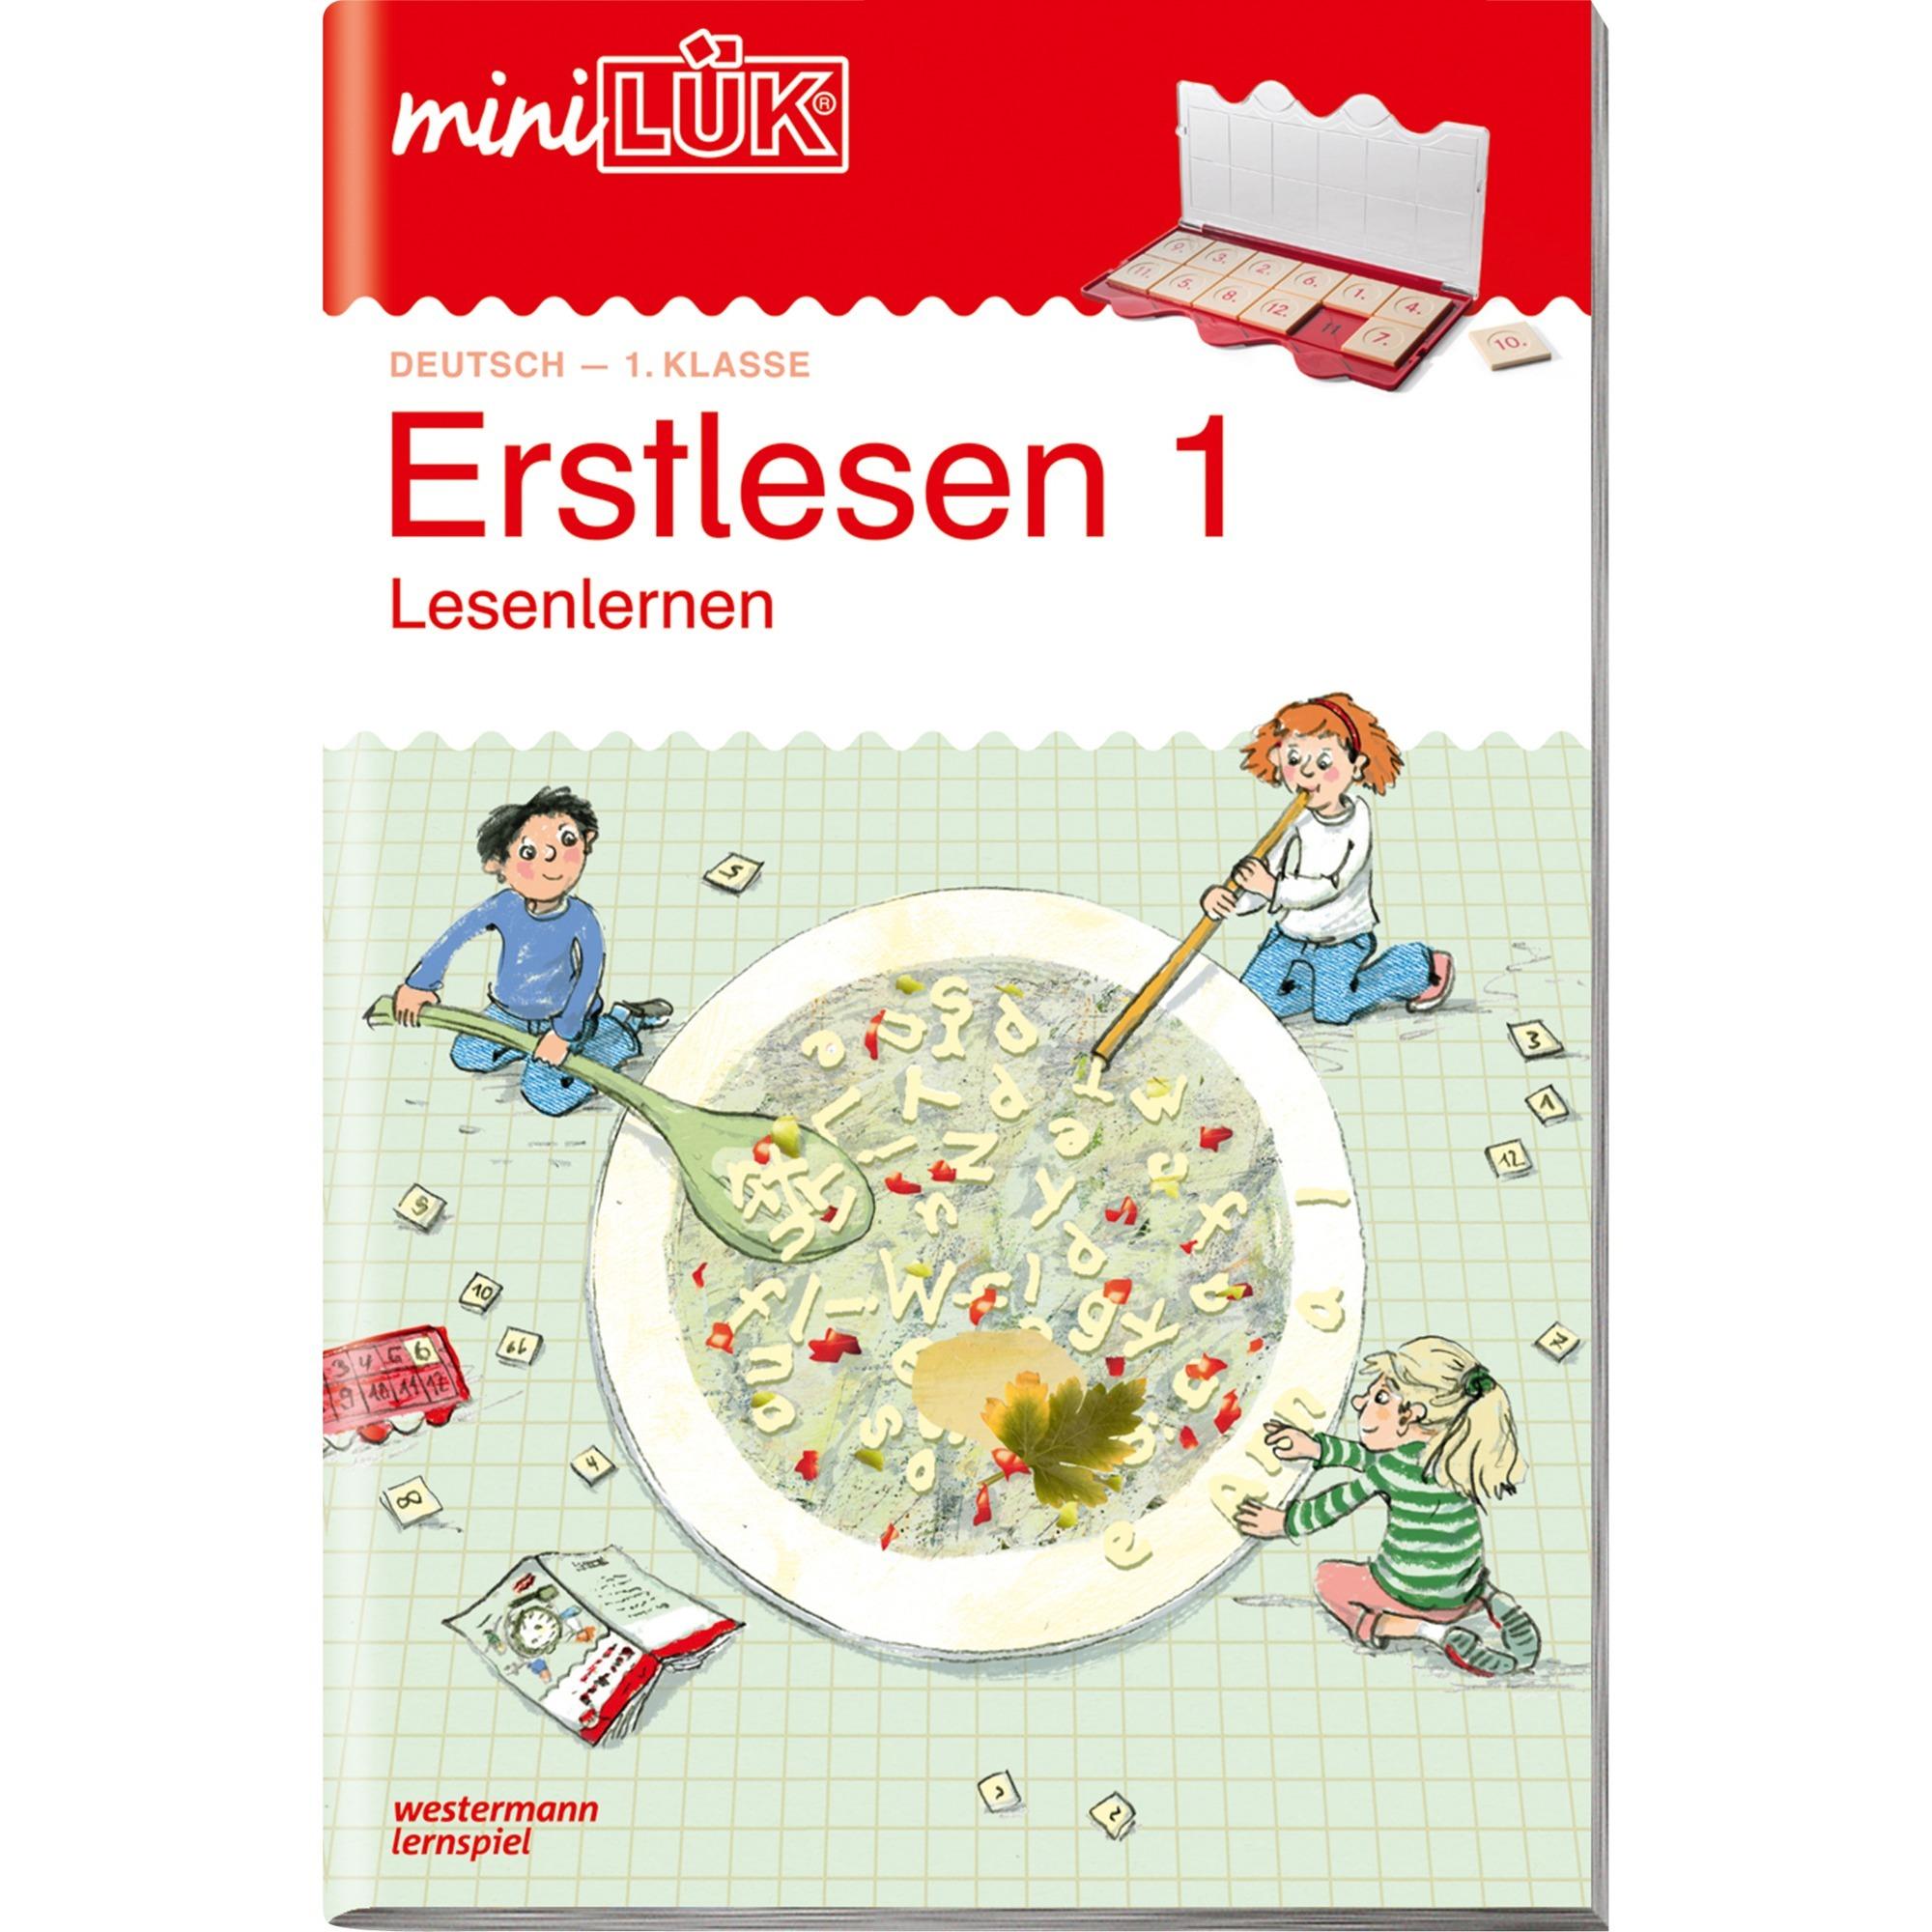 978-3-8377-0137-1 libro infantil, Libro tutorial